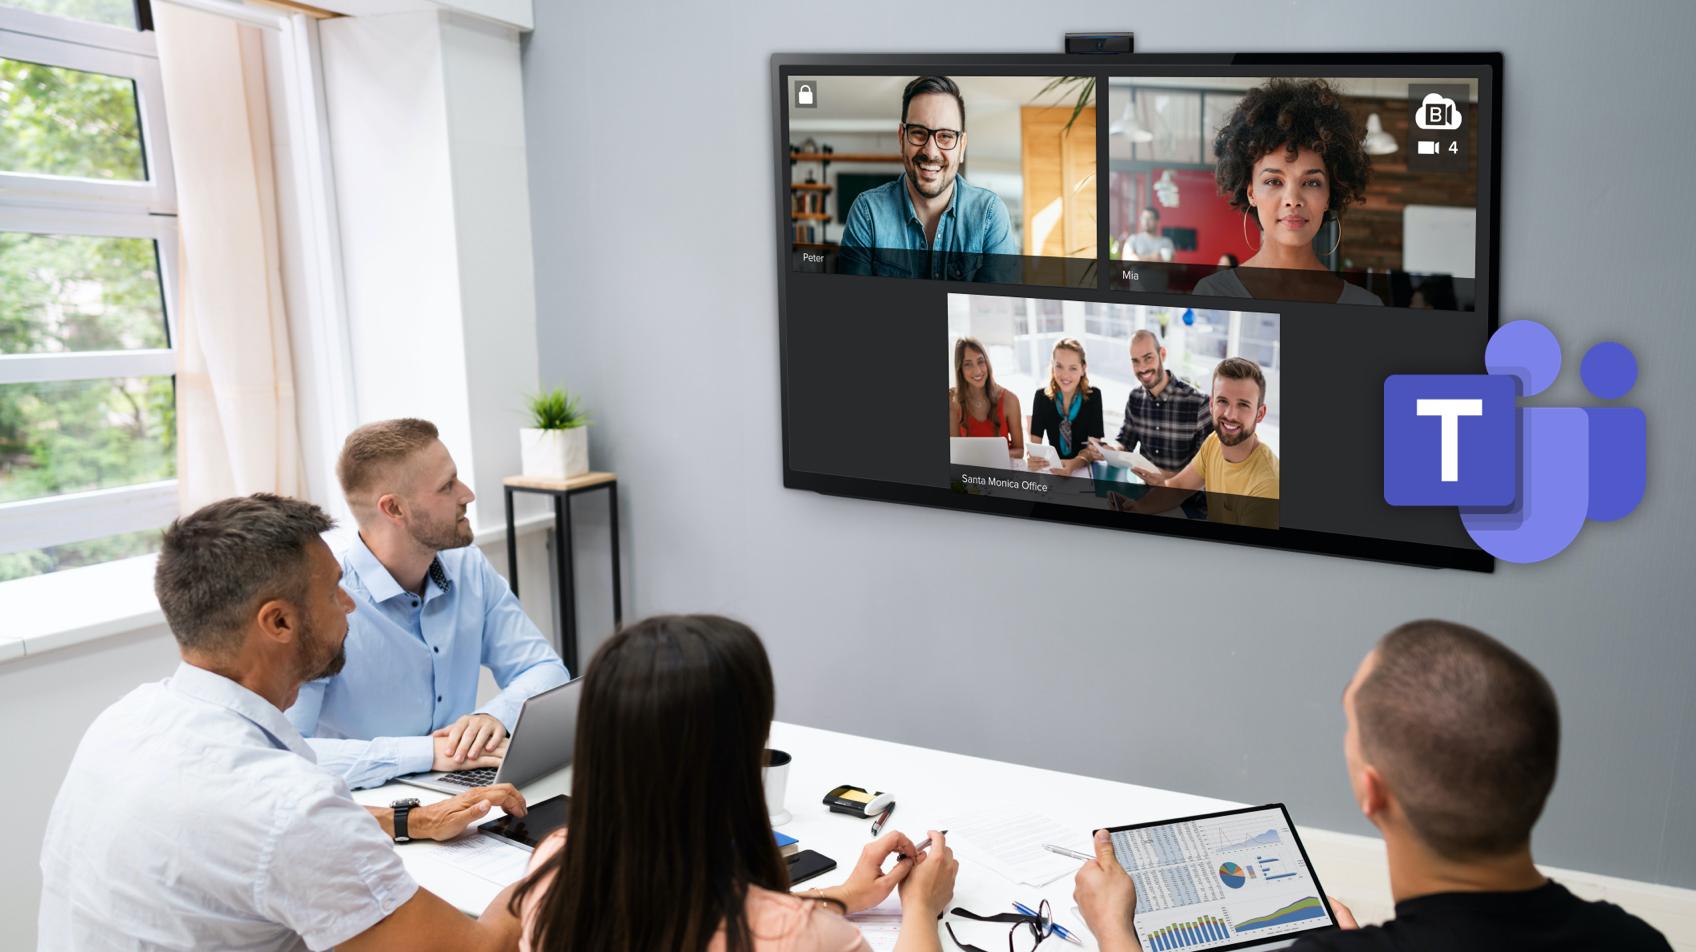 BlueJeans Microsoft Gateway Video Calling Software